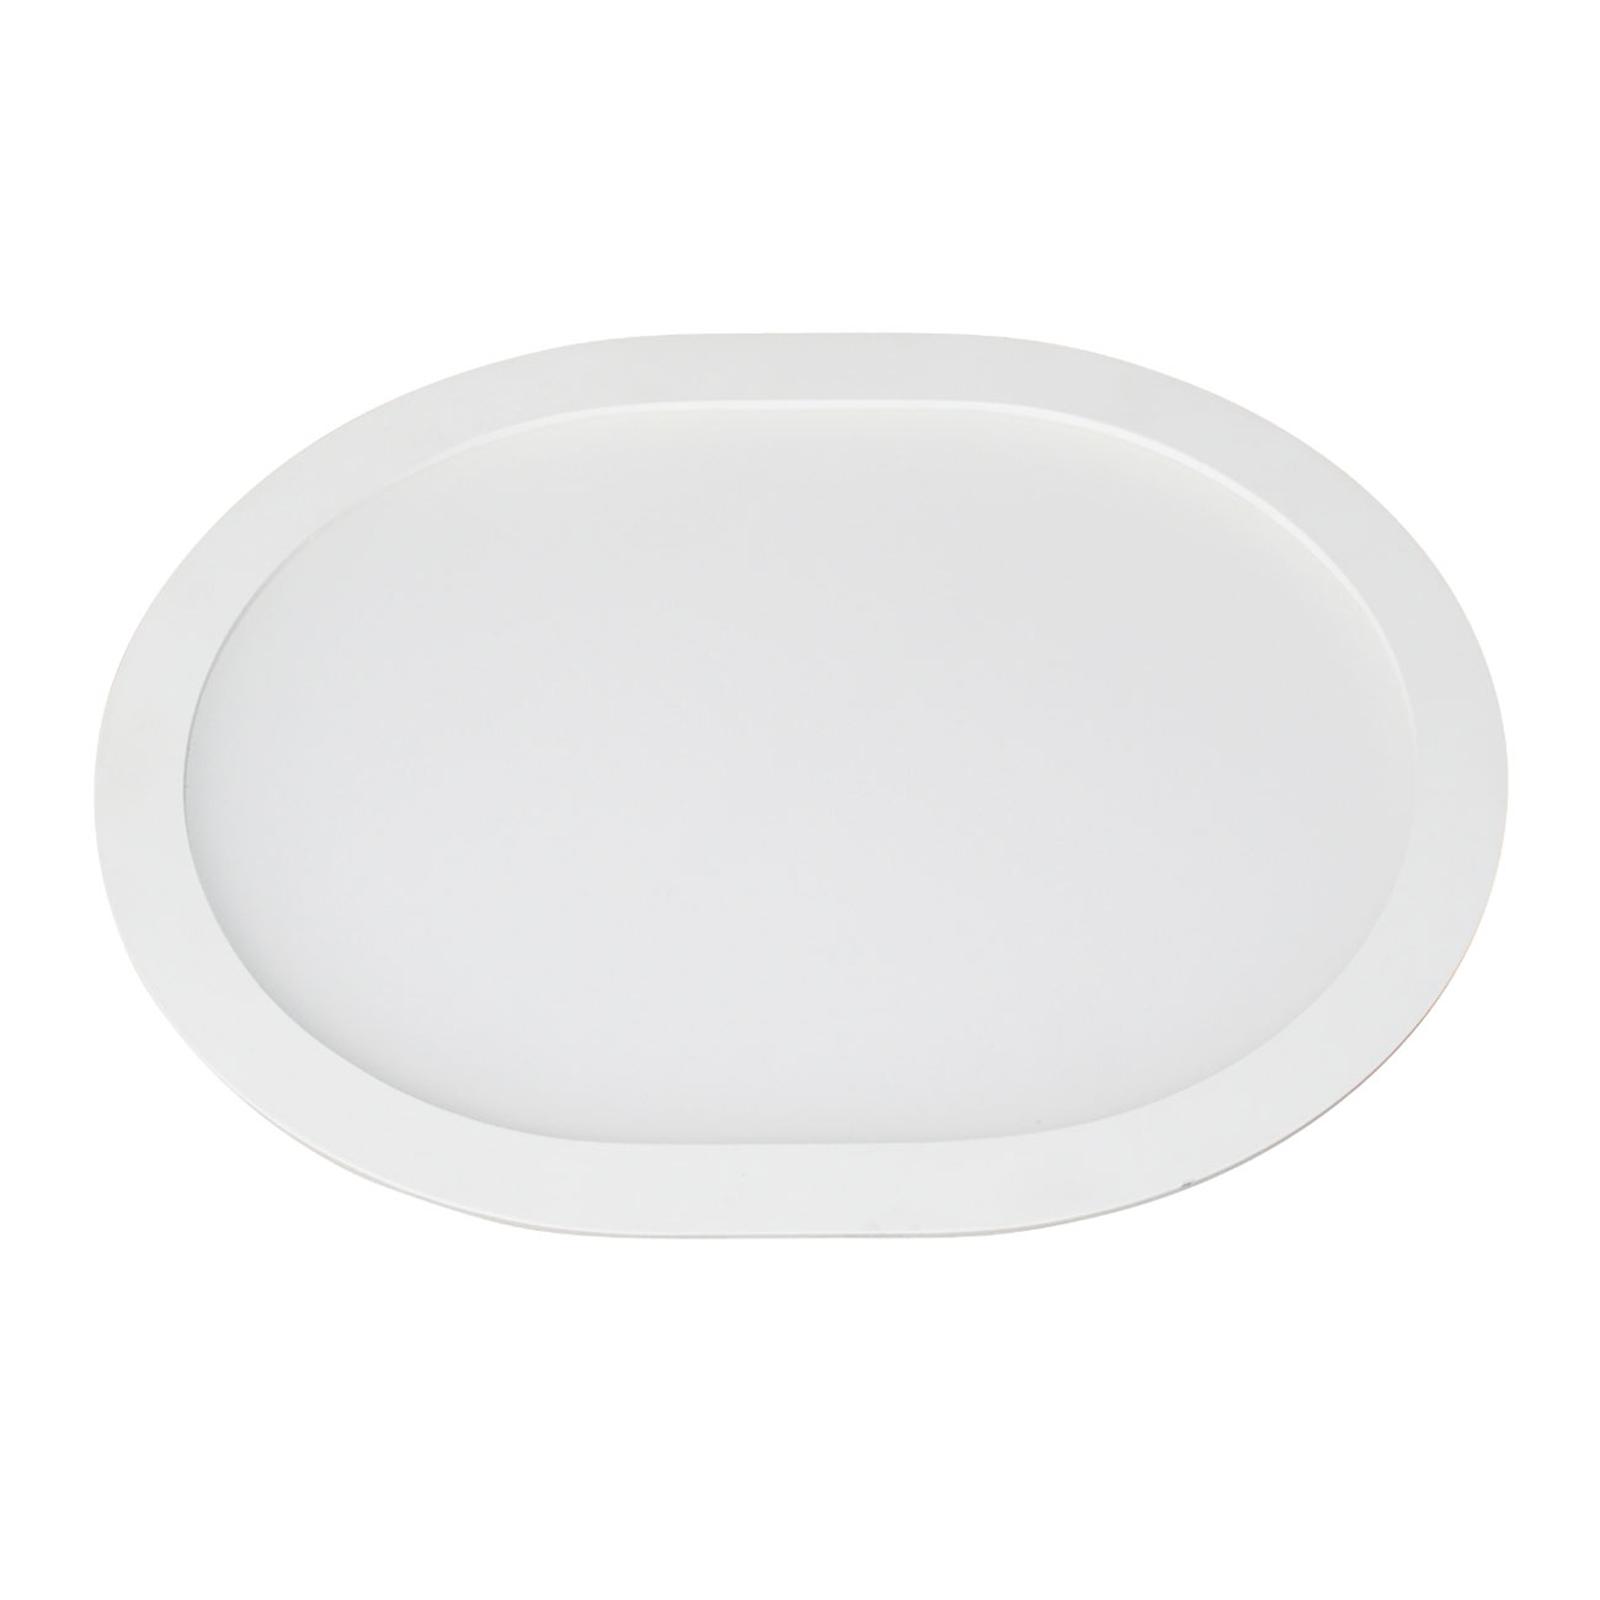 LED-uppopaneeli Ovale, 4 500 K, 26 cm x 21,6 cm